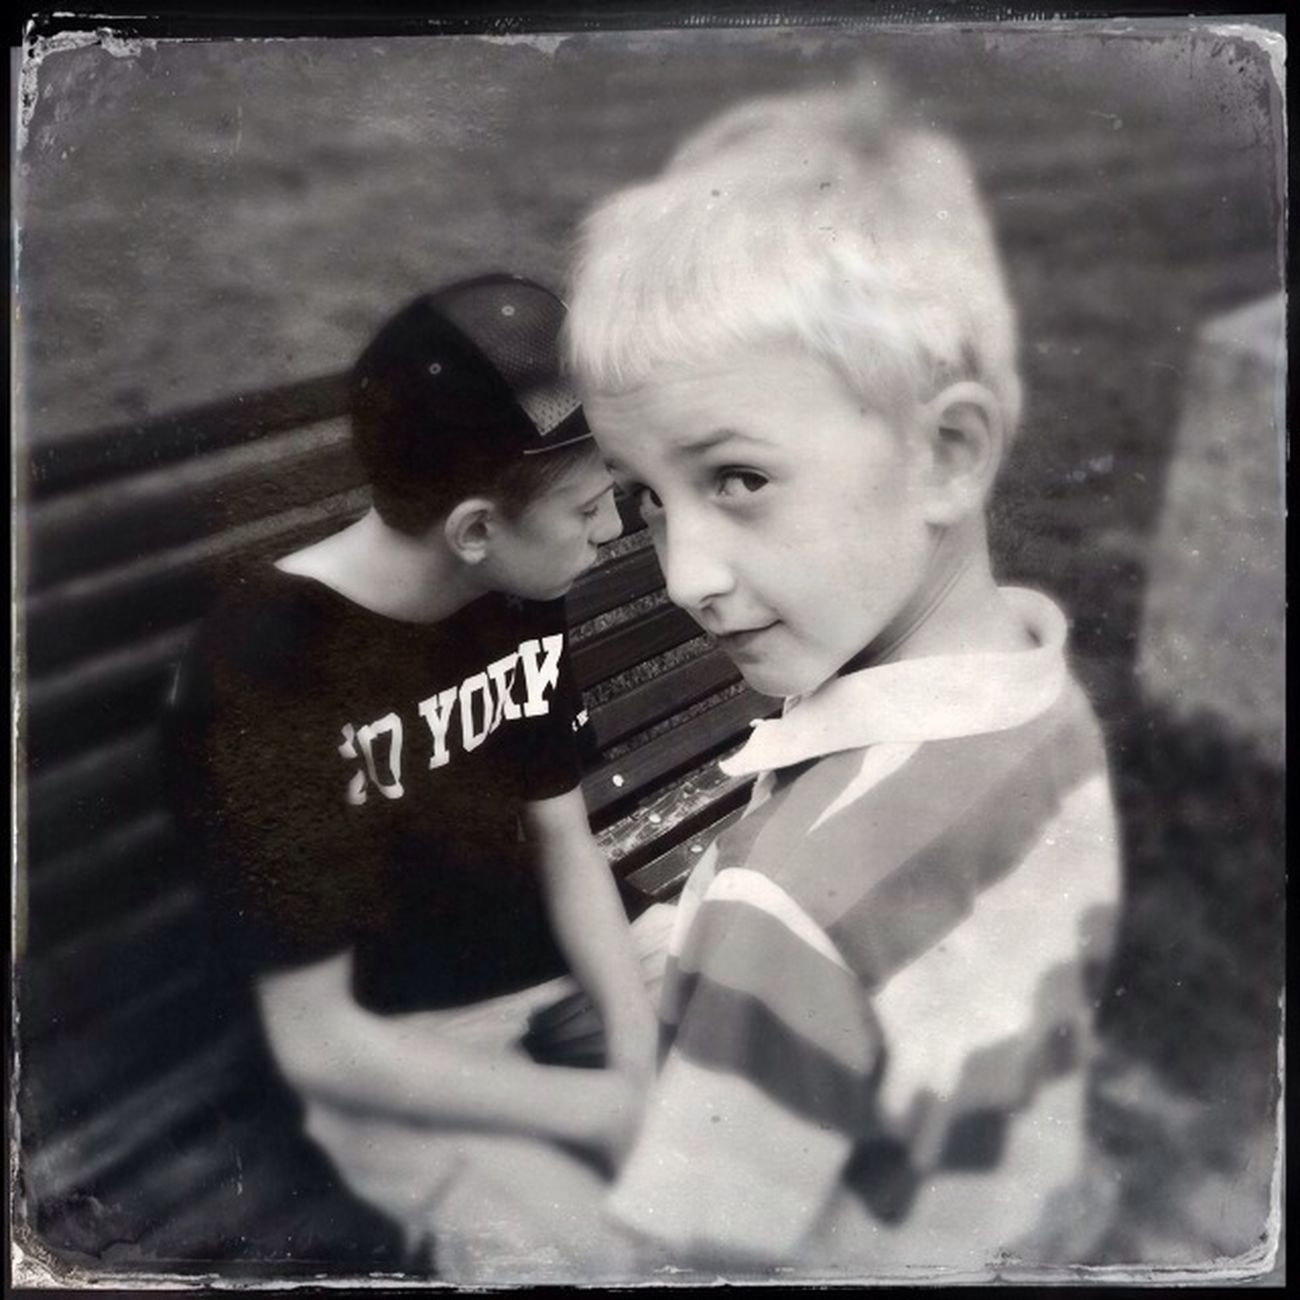 Filippa K Asks: What Inspires You? Bw_collection NEM Black&white Taking Photos